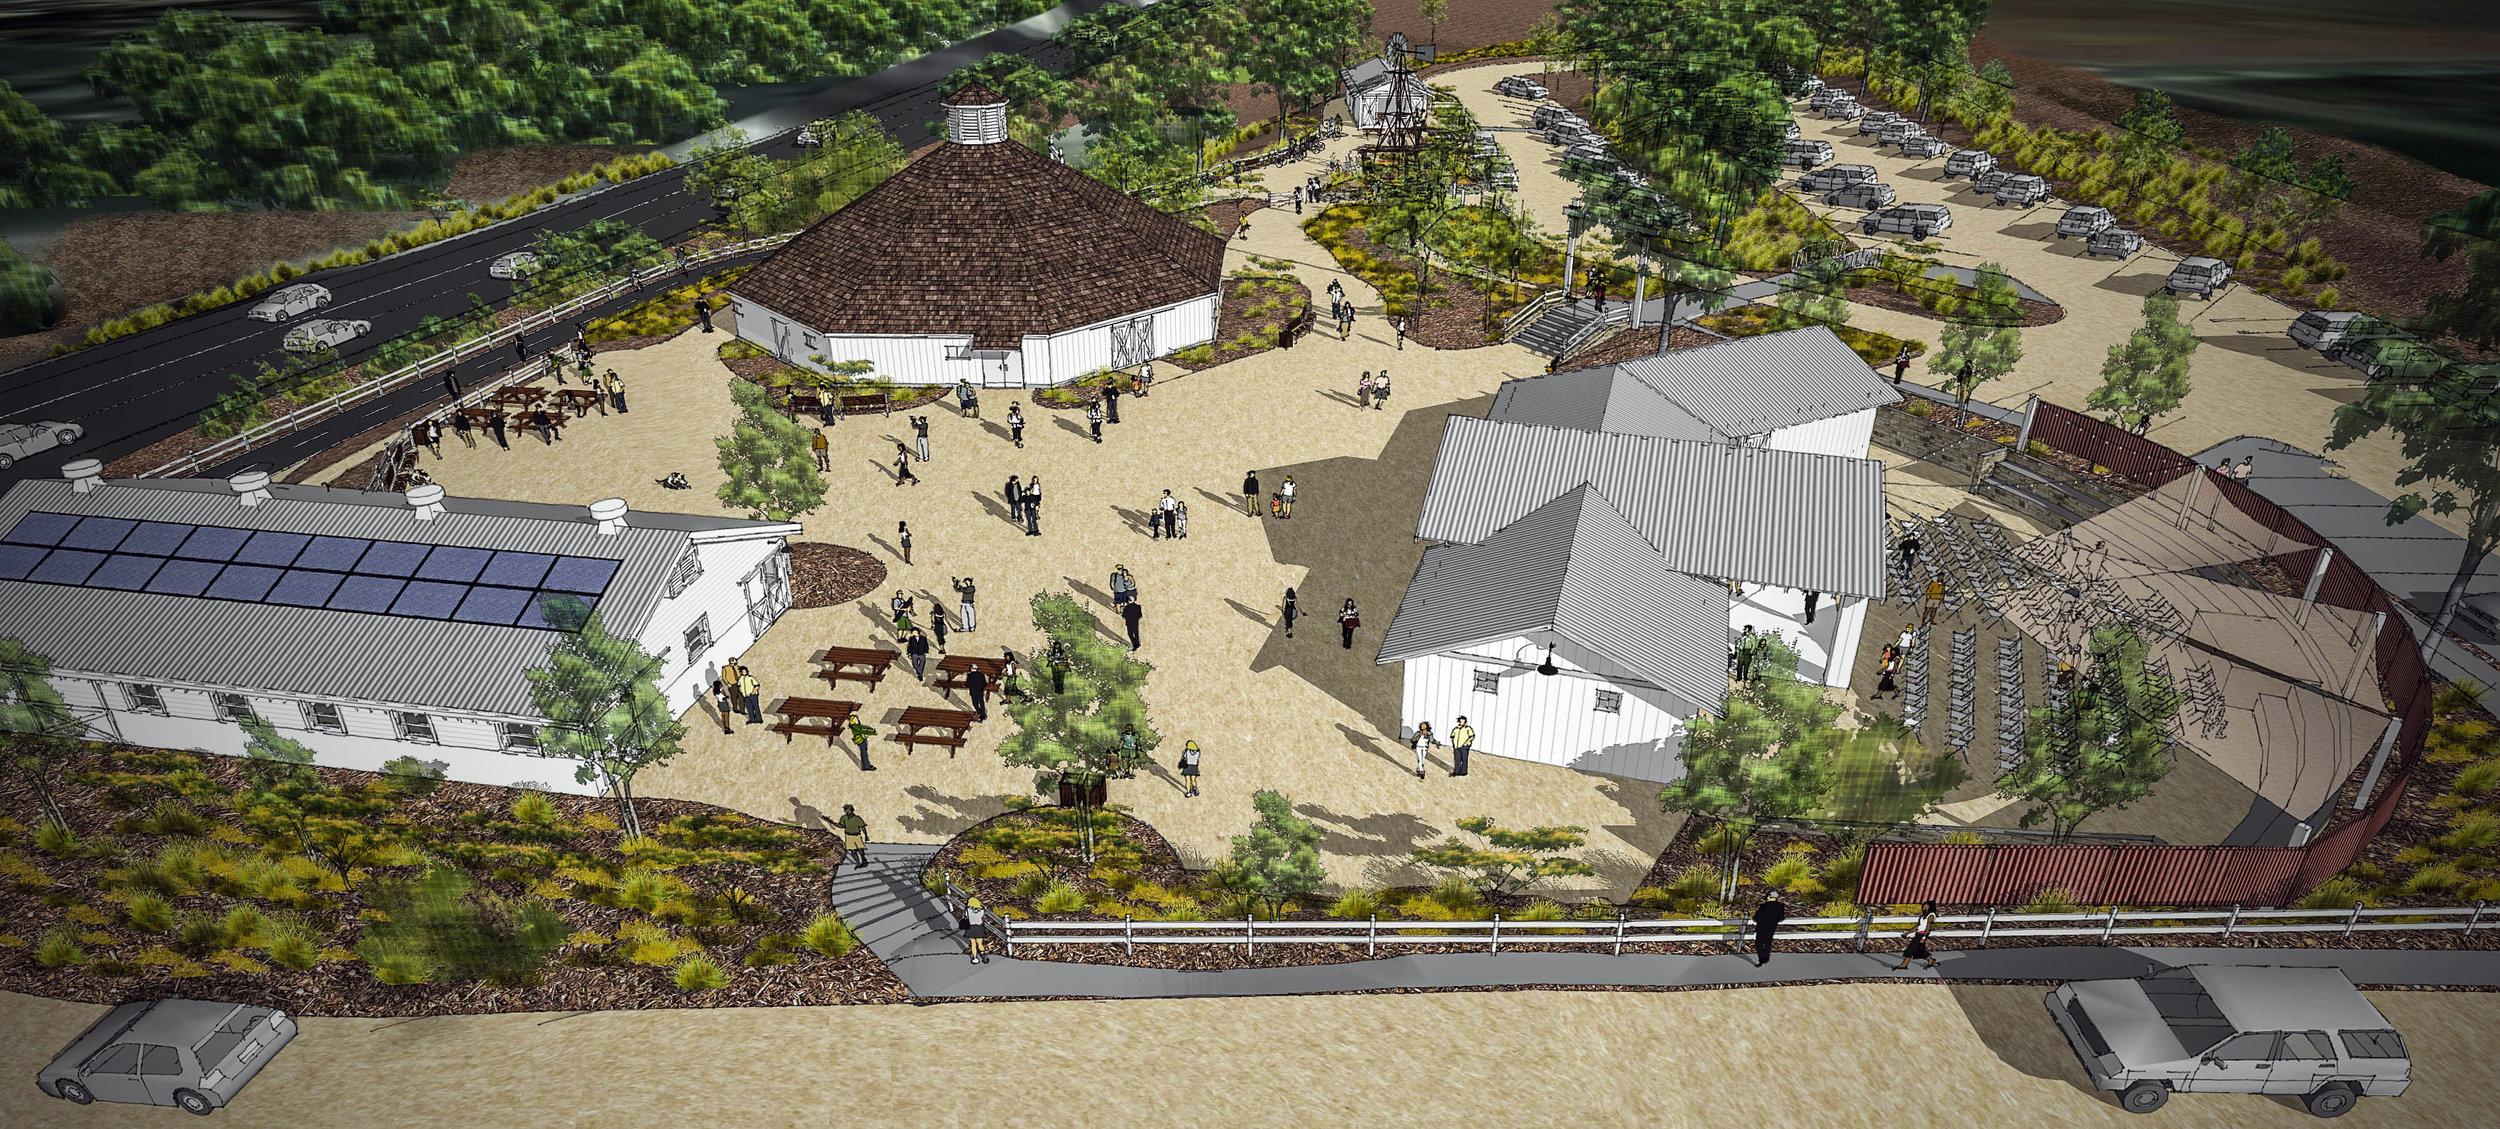 Octagon Barn Landscape Architecure Plan View.jpg